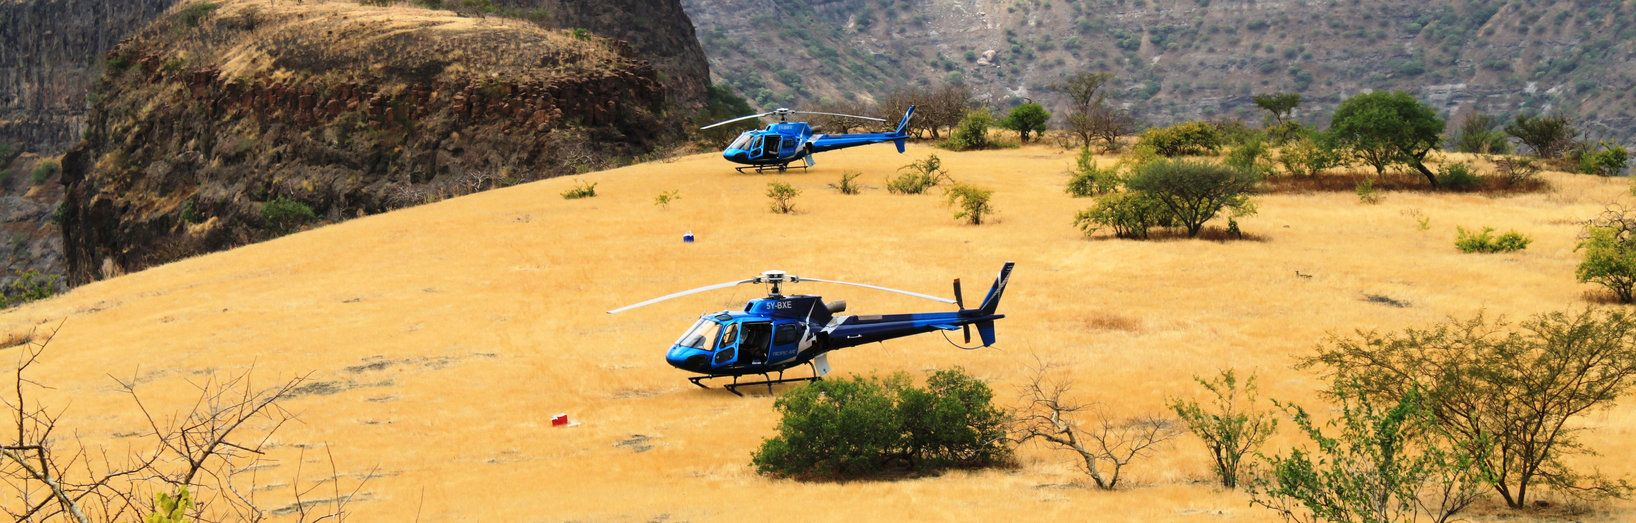 tanzania helicopter safaris 3